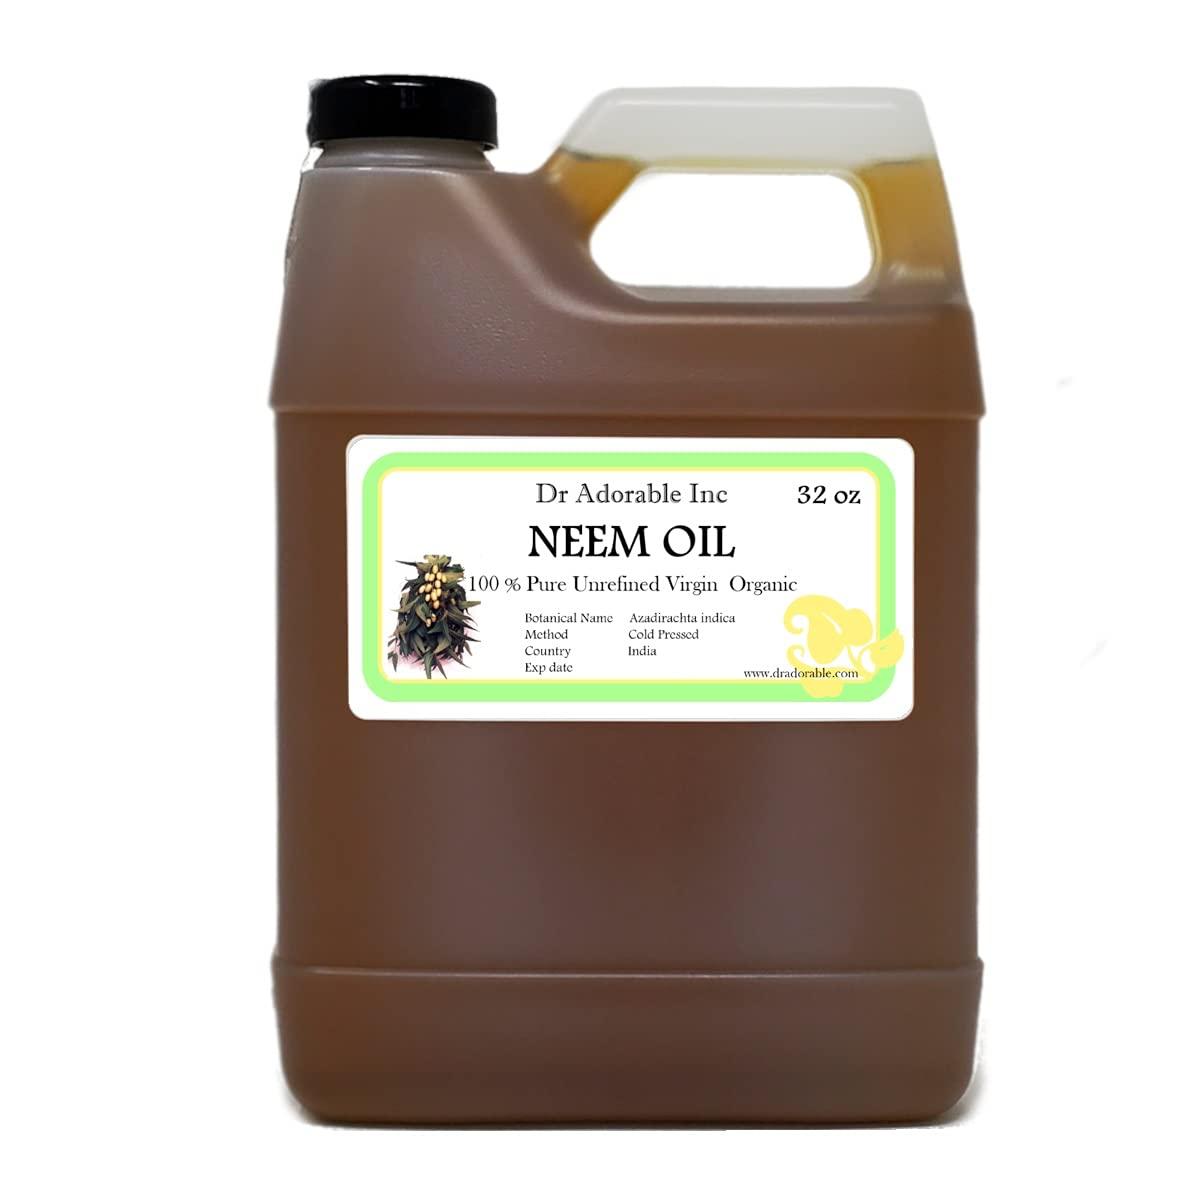 Neem Oil Organic Pure Oz Excellent 32 Quart Max 79% OFF 1